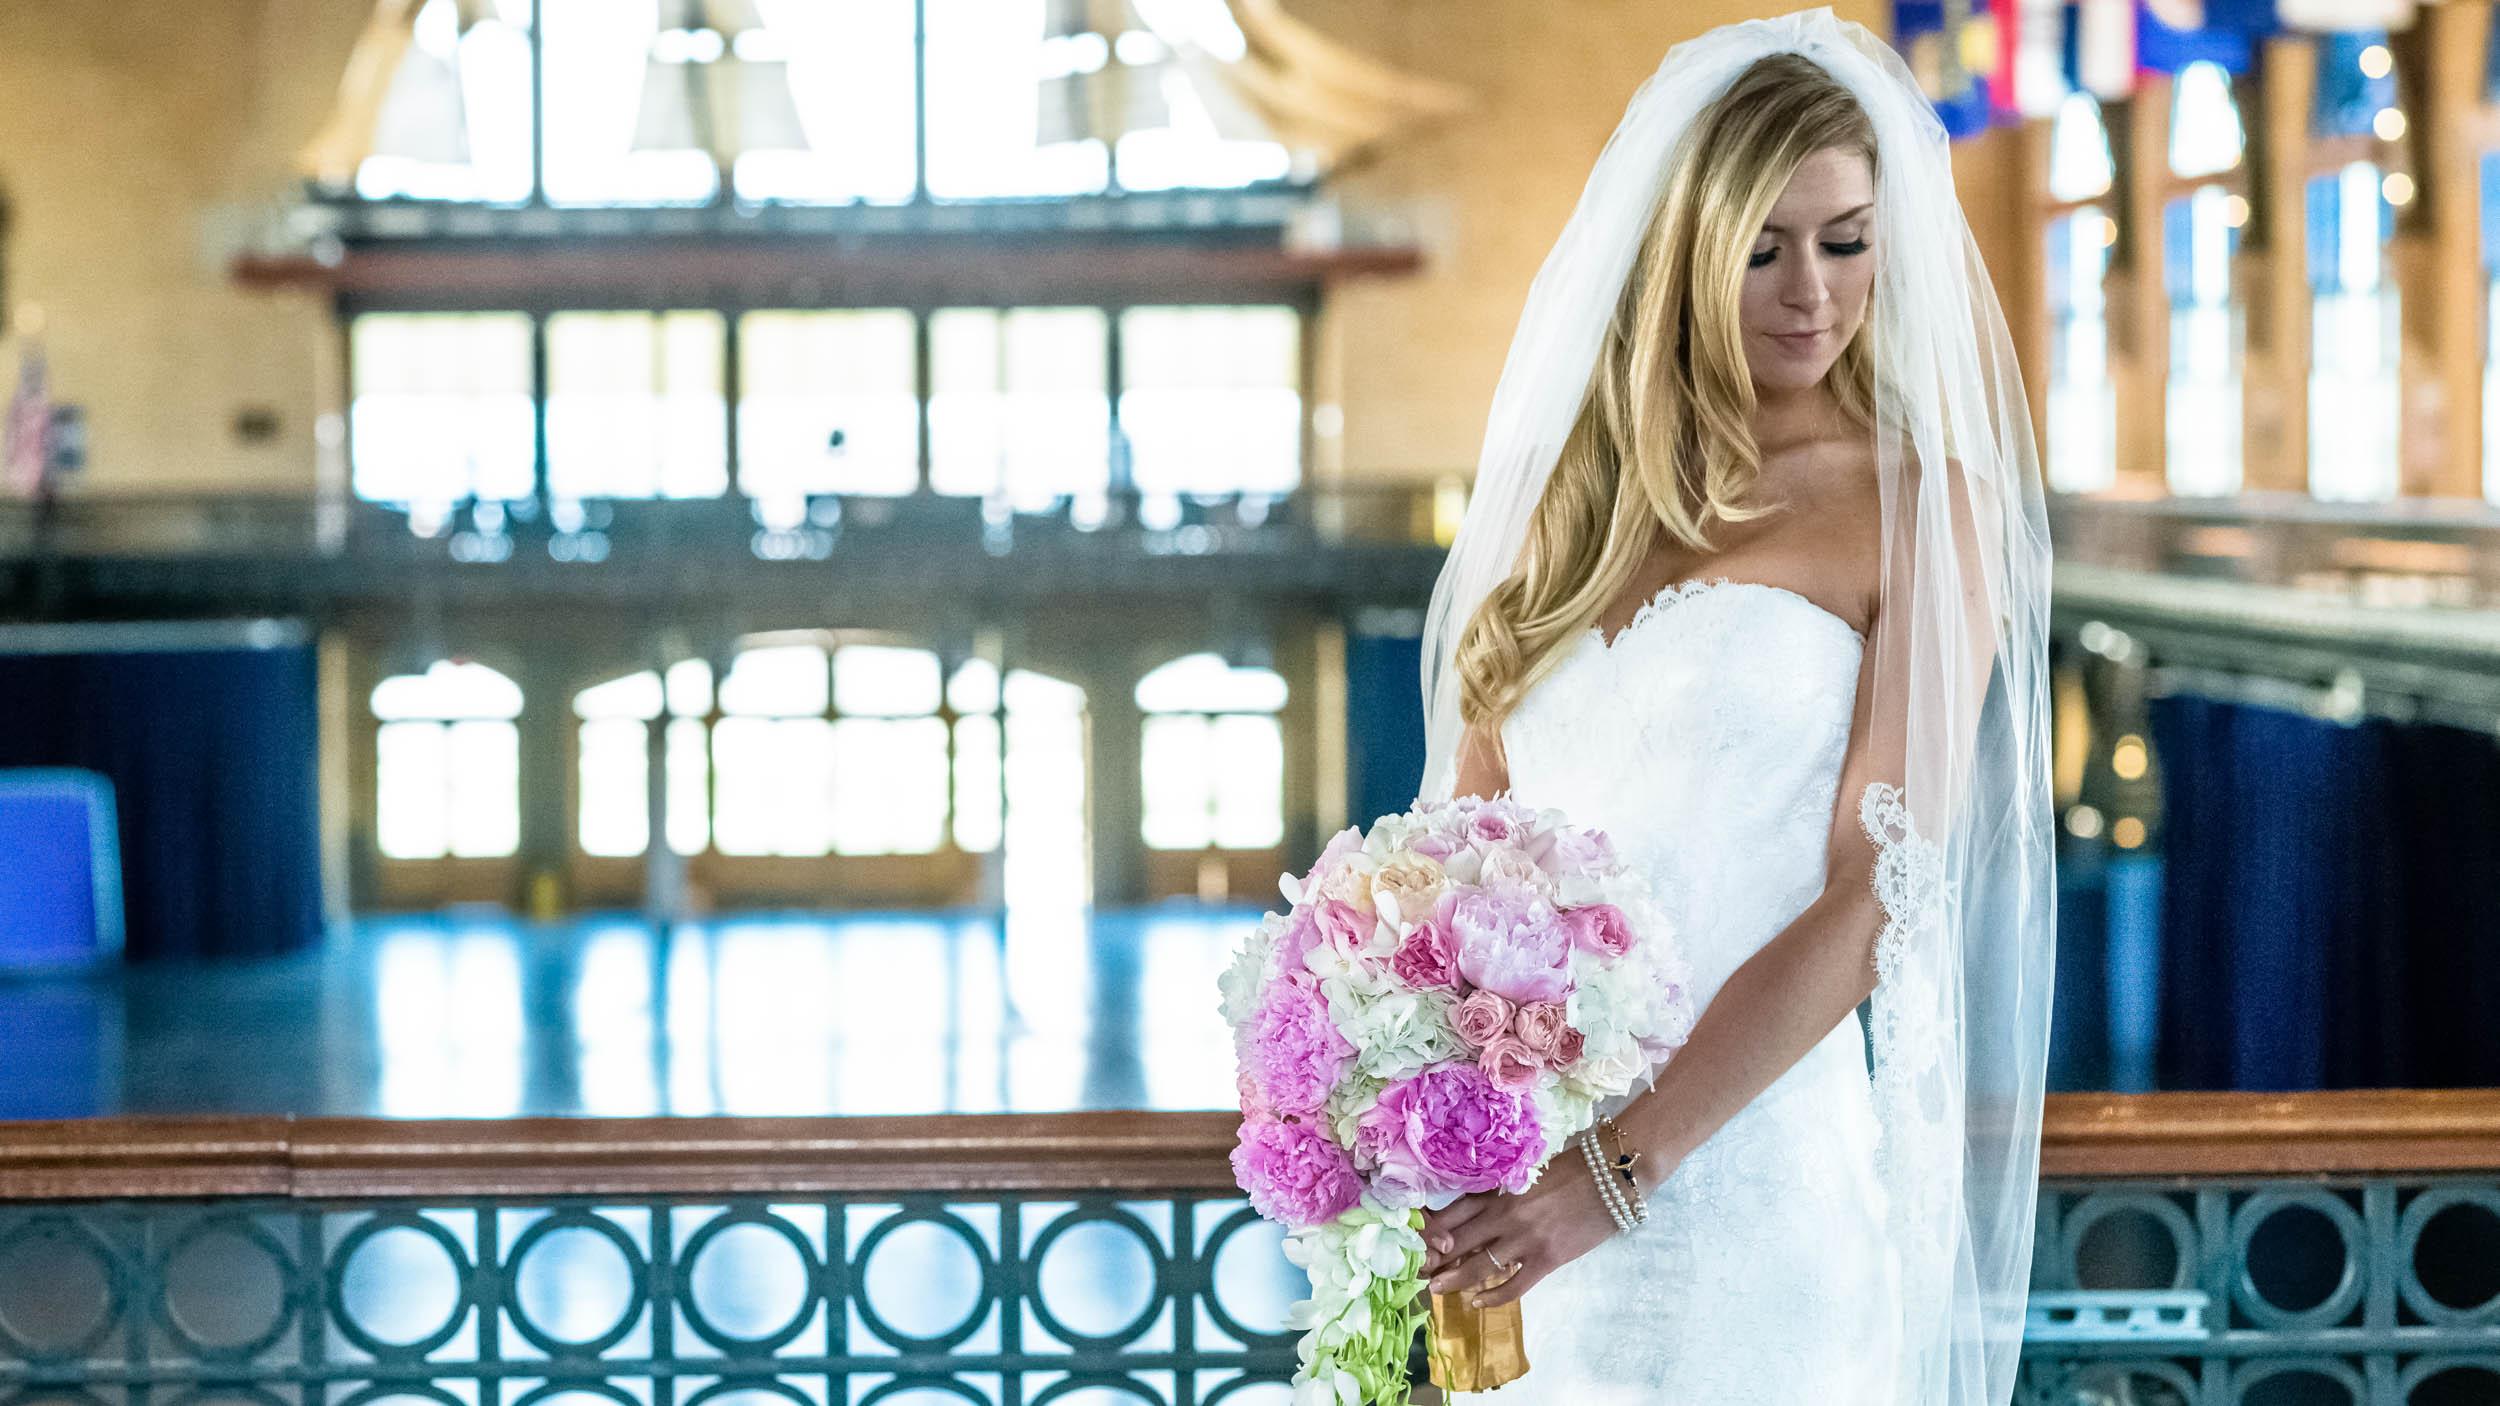 dc+metro+wedding+photographer+vadym+guliuk+photography+wedding+bride-2022.jpg